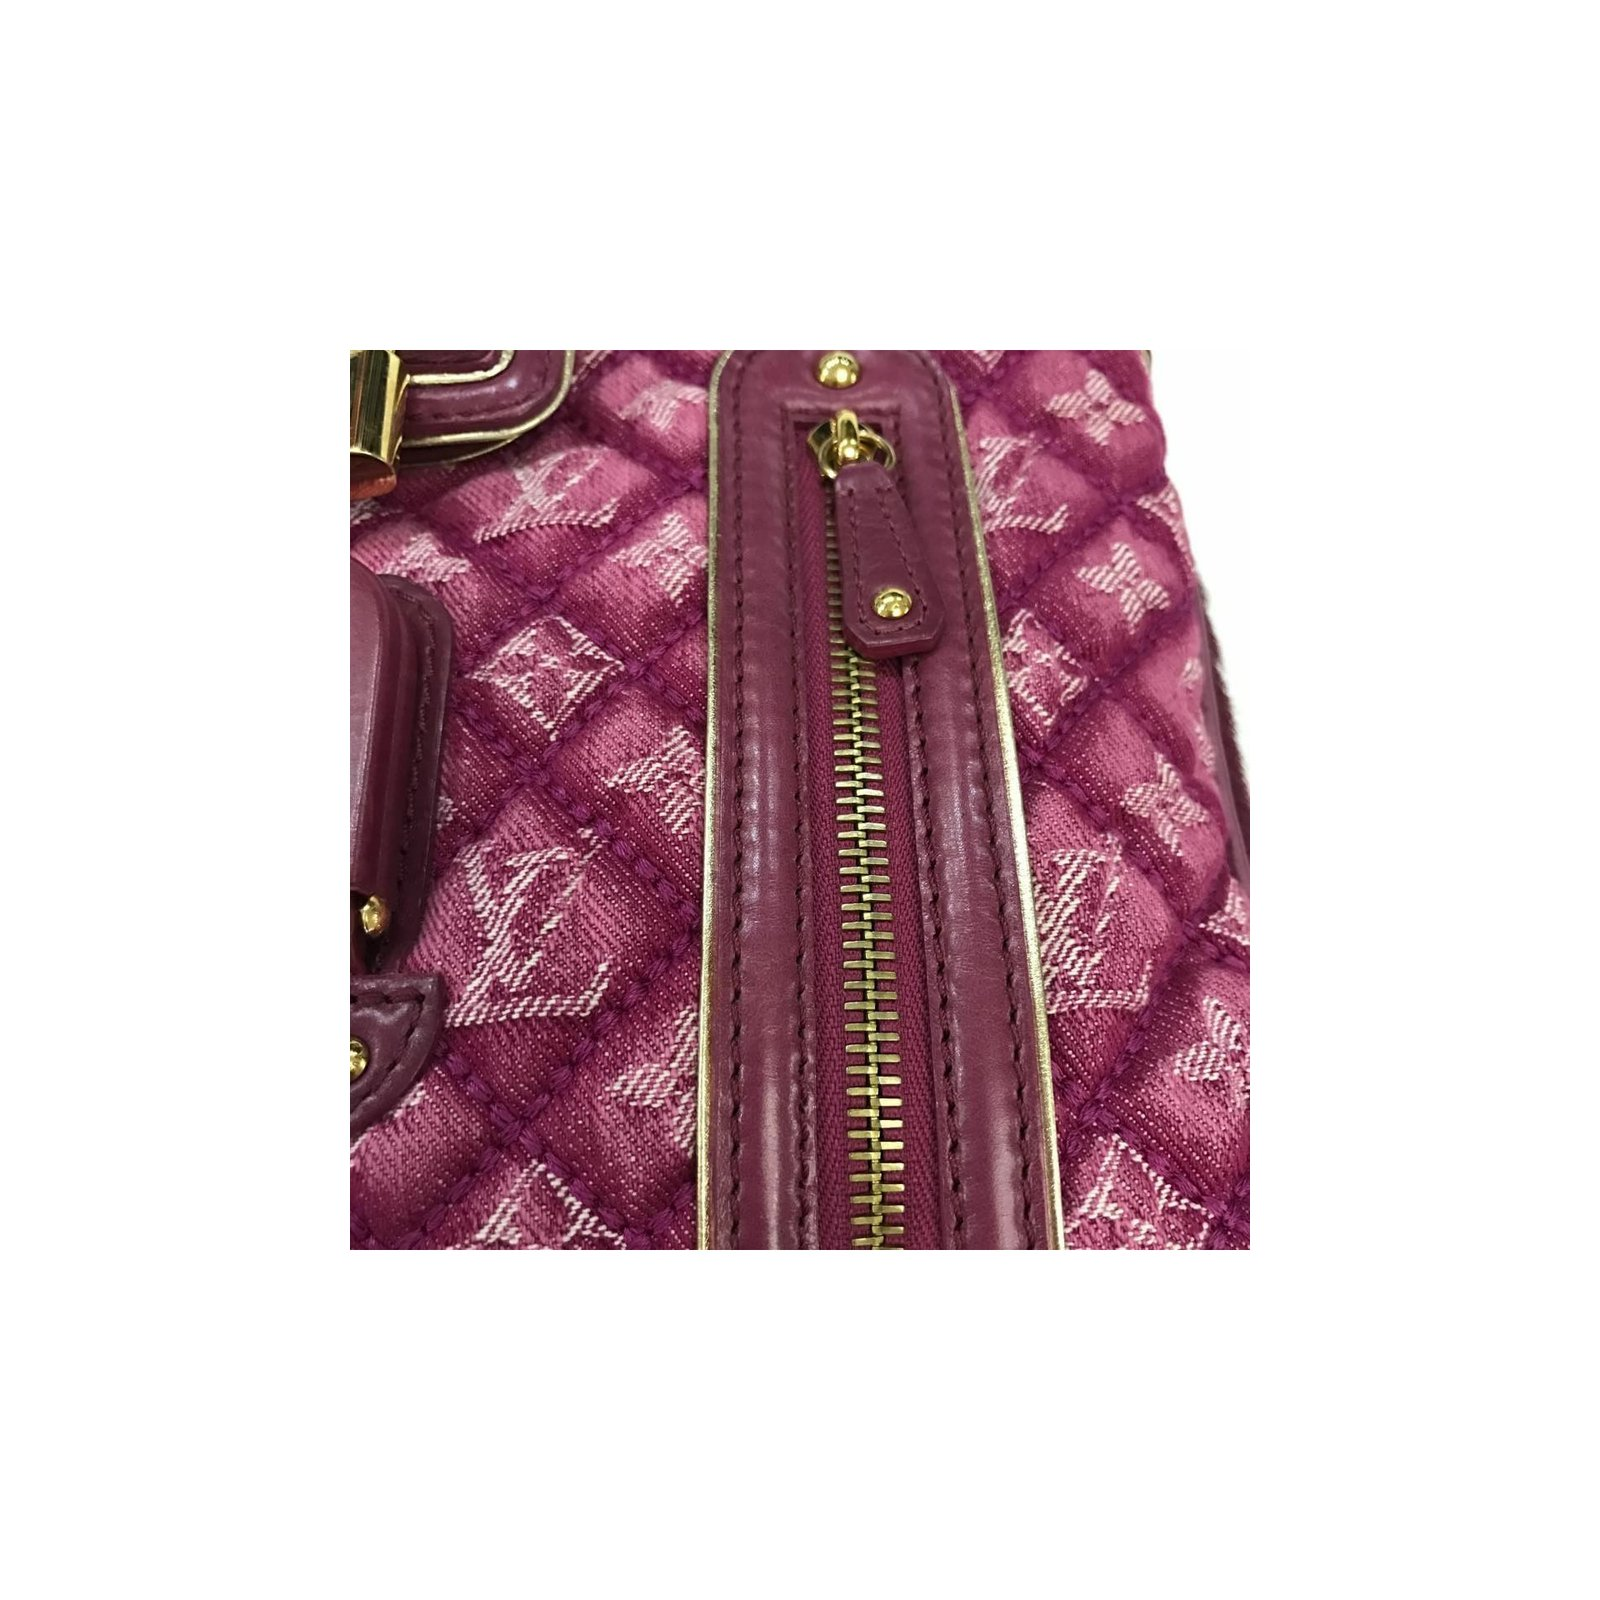 e6d7bcf668a9 Louis Vuitton Monogram Quilted Denim Linda Fuchsia Handbags Denim Pink  ref.36053 - Joli Closet